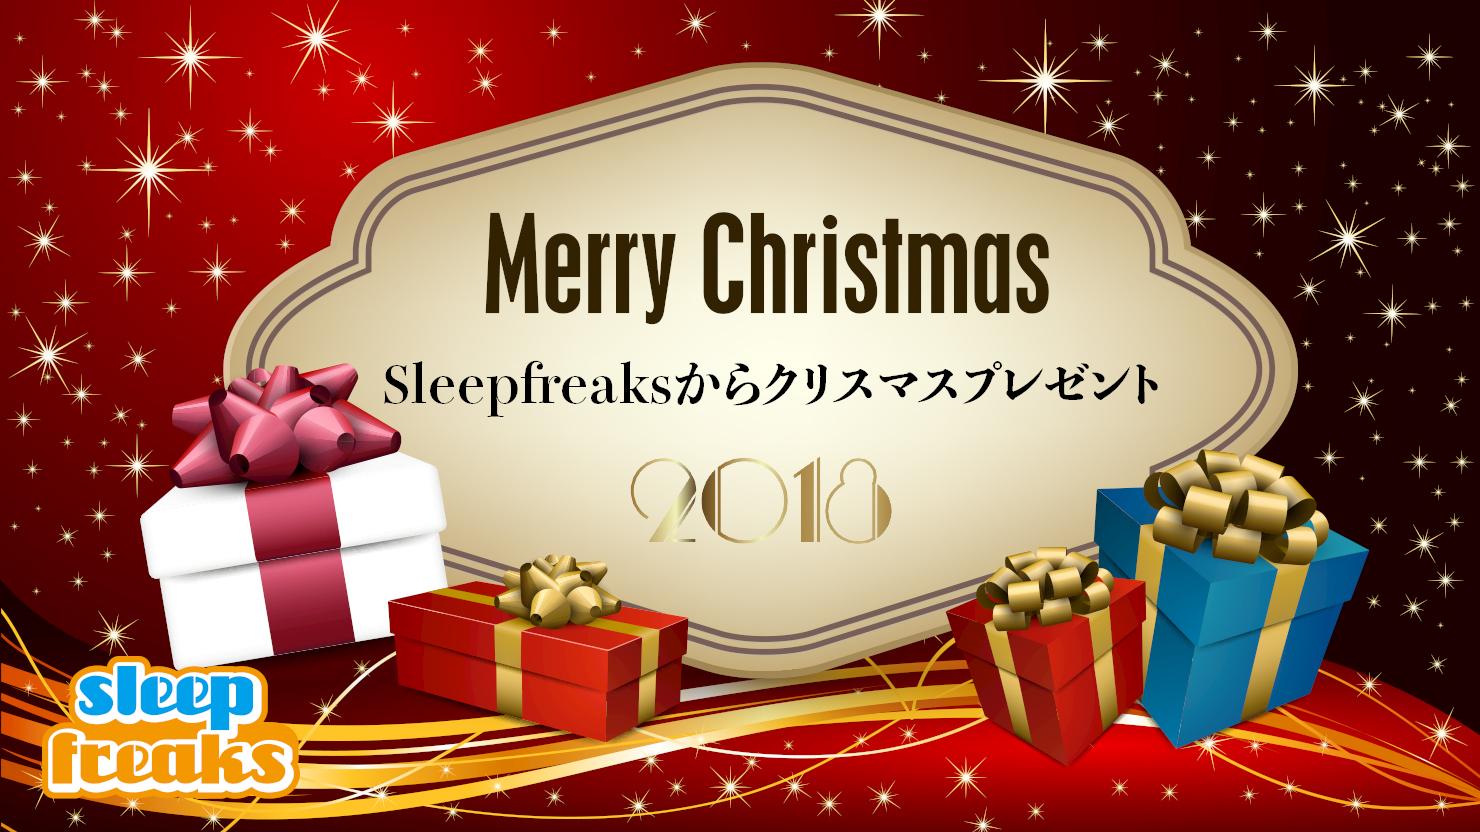 xmas-present-2018-sleepfreaks